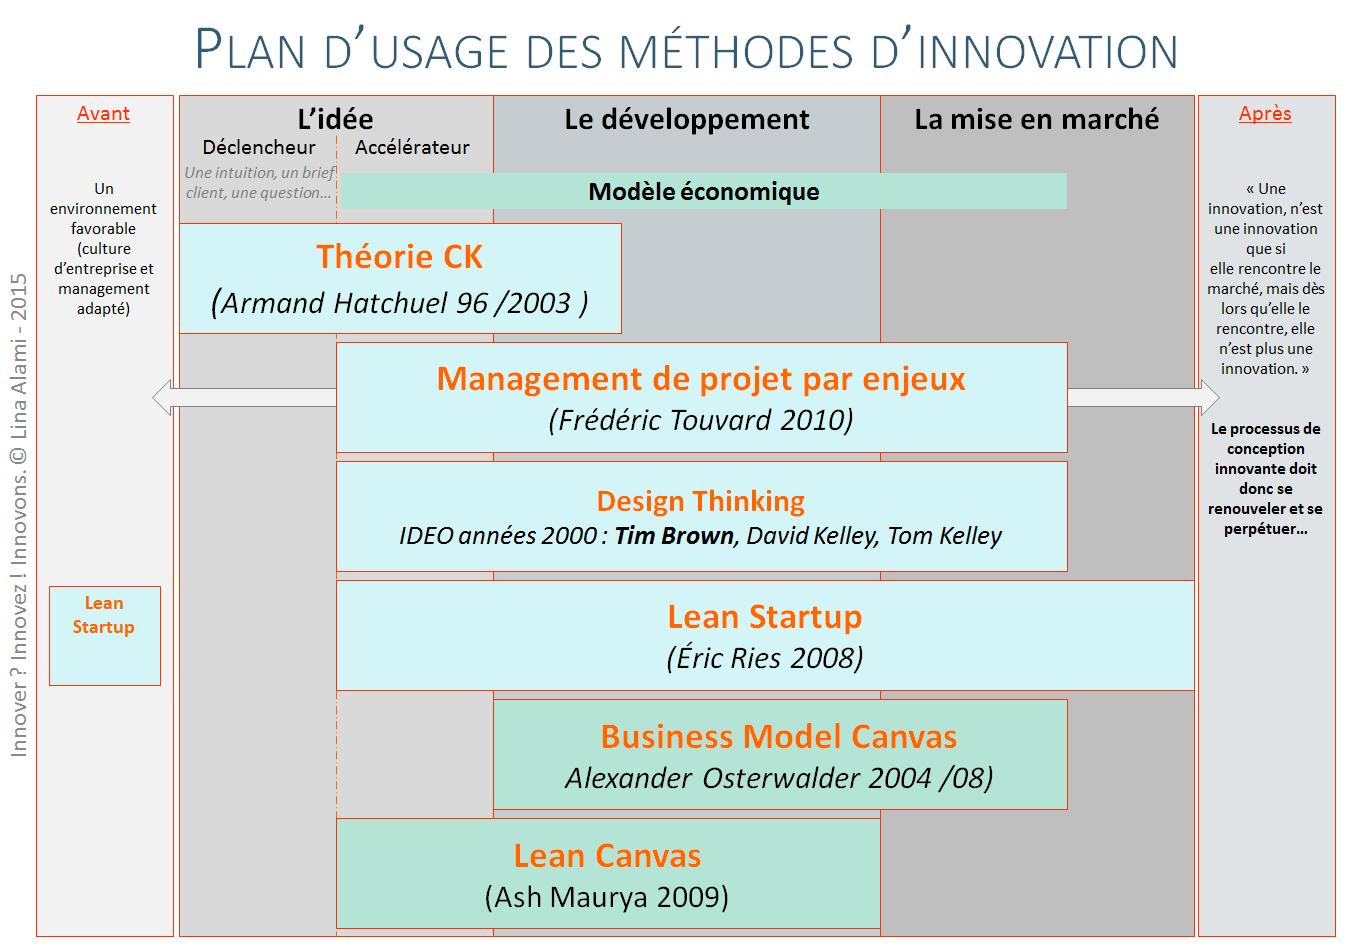 comment innover : plan usage methodes innovation - Lina Alami